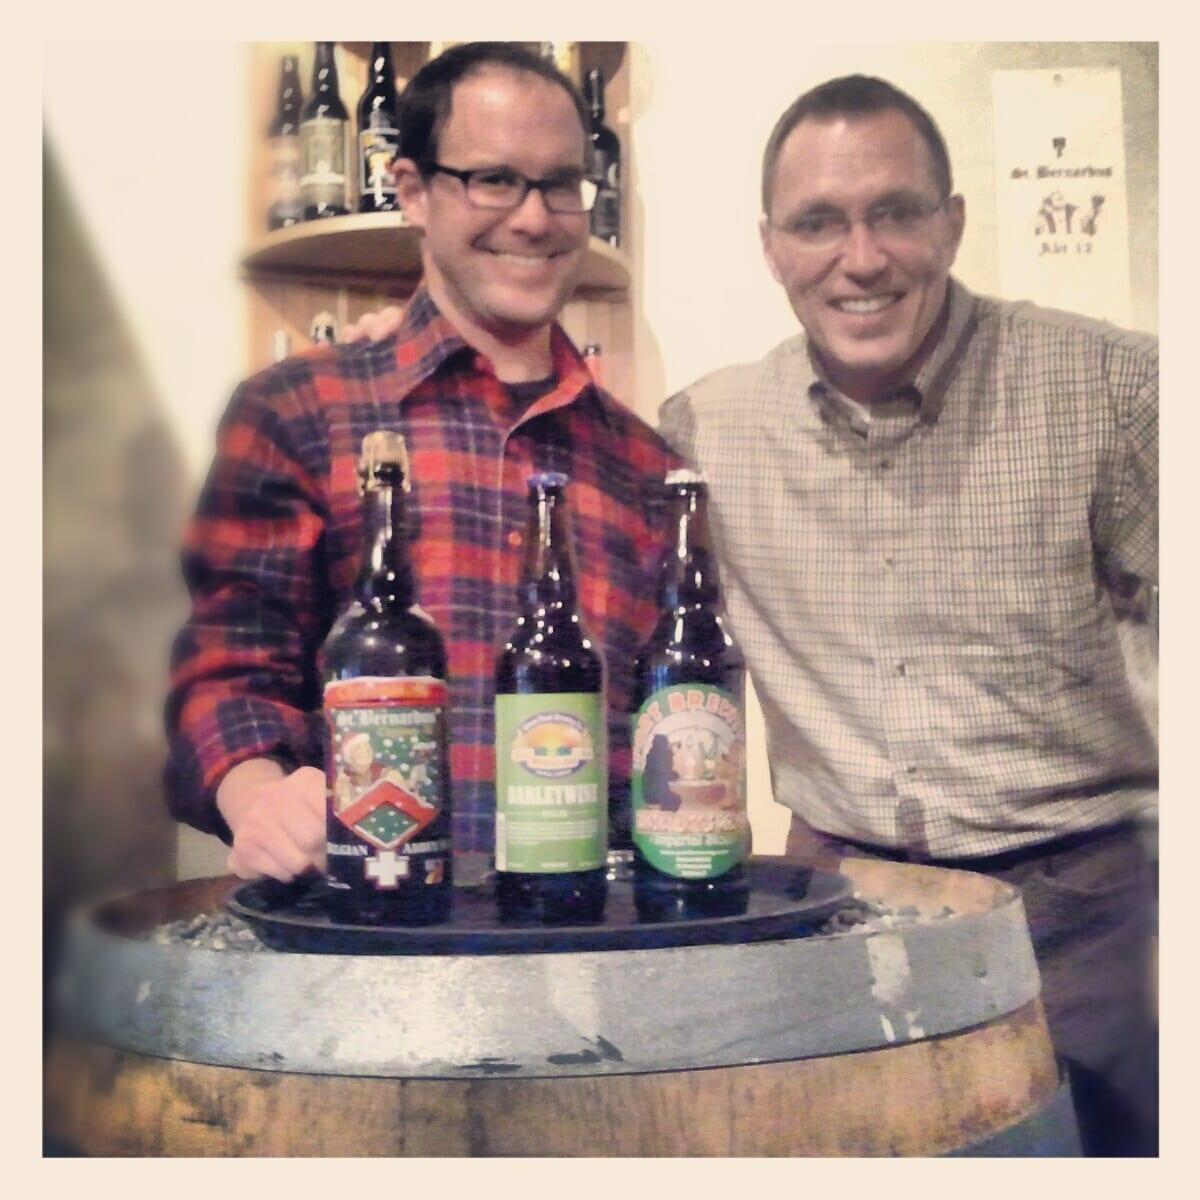 Bellingham, Beer Week, Elizabeth Station, Whatcom County, Craft beer, Boundary Bay, Chuckanut Brewery, Kulshan Brewing Company